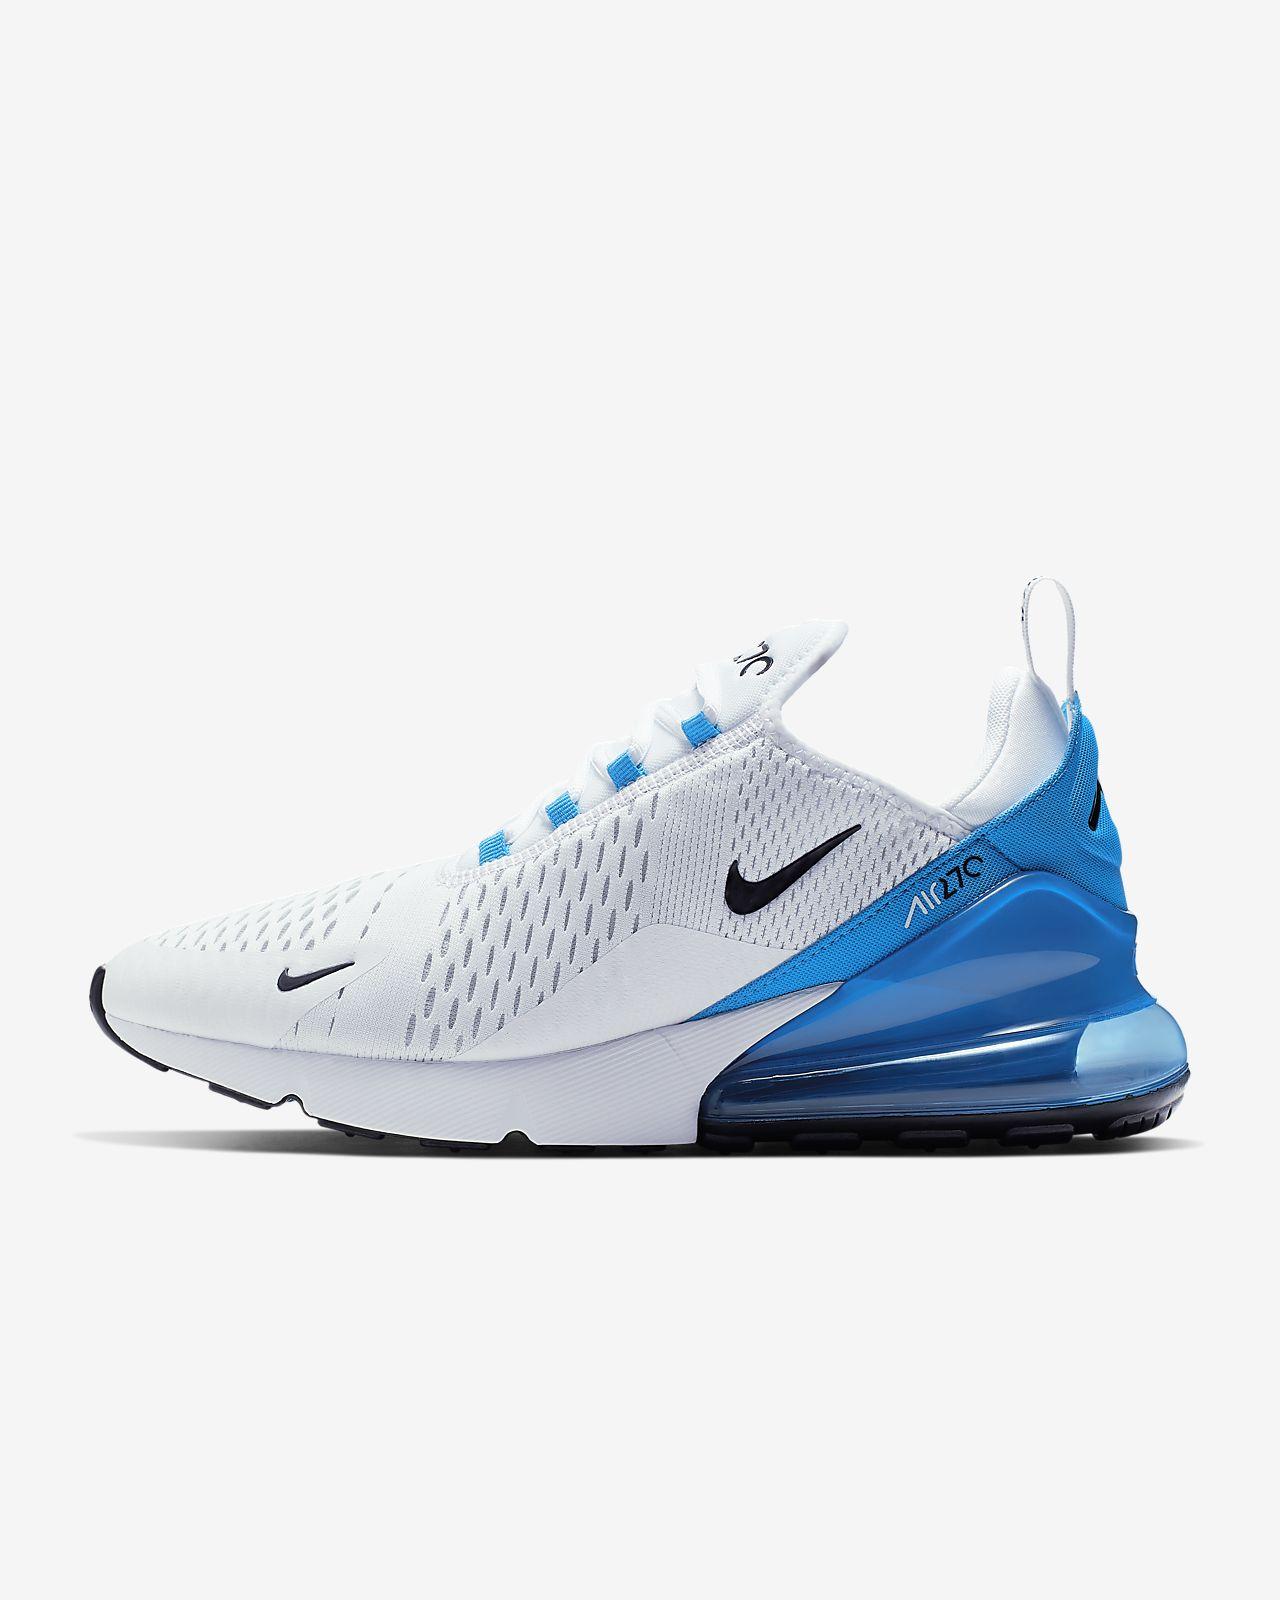 df778970452de Scarpa Nike Air Max 270 - Uomo. Nike.com IT